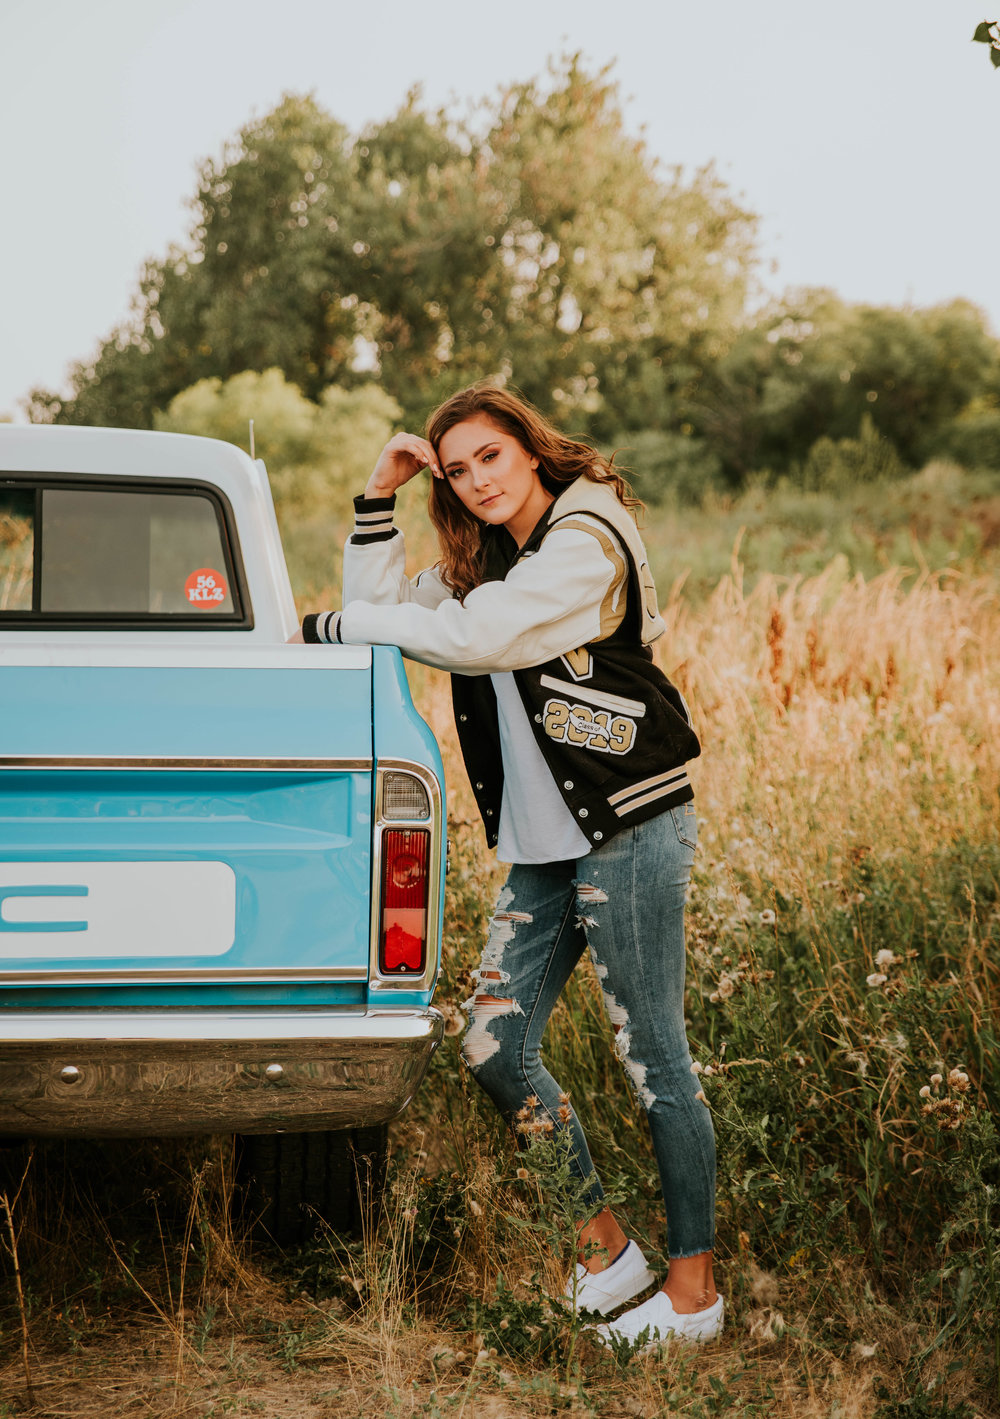 Miss. Miller's Photography | Colorado Senior Photographer | Senior Photos with Truck | Girls Senior Photos 2018 | Modern Senior Photos | Candid senior poses | senior photos with cars | gmc truck | senior photo poses | senior photo ideas girls | summer senior photos